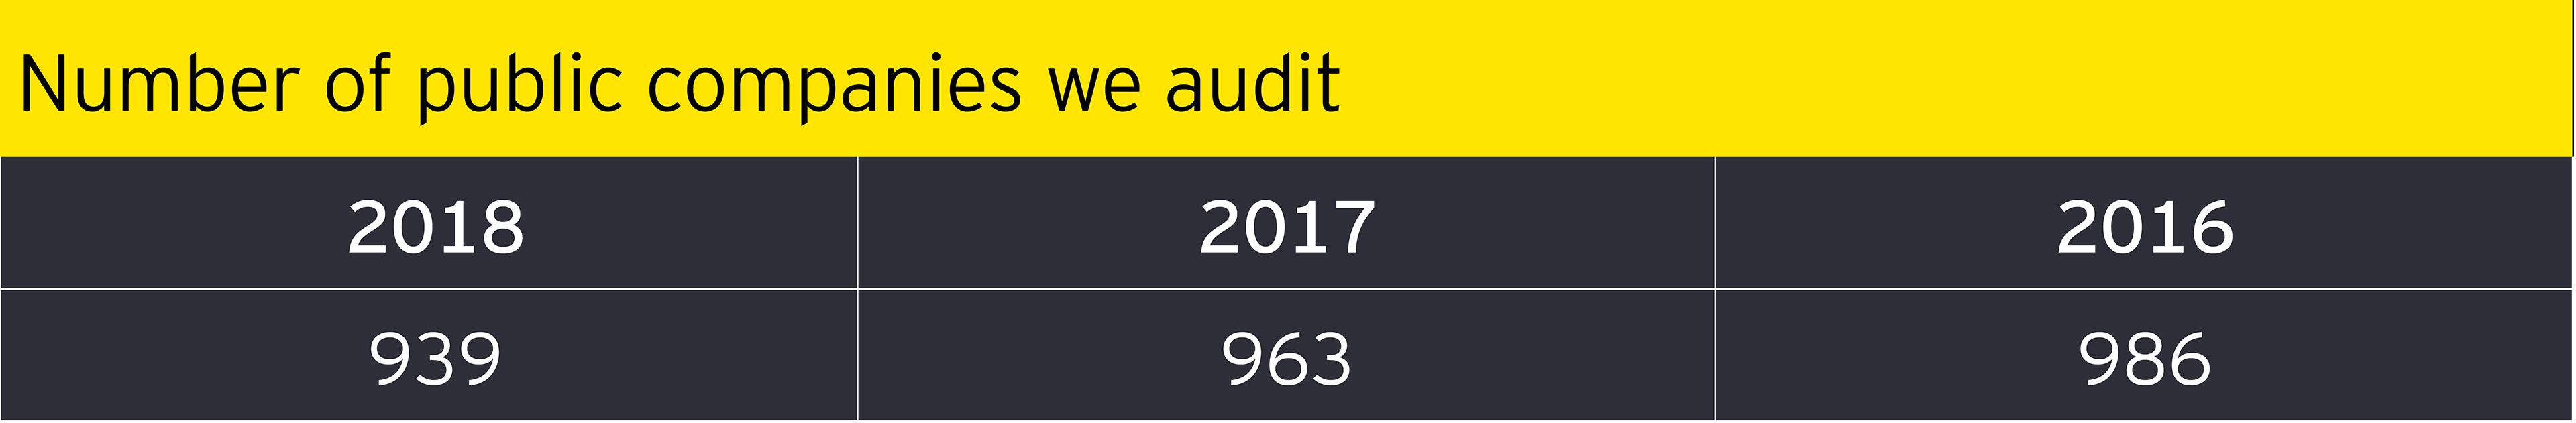 Number of public companies we audit